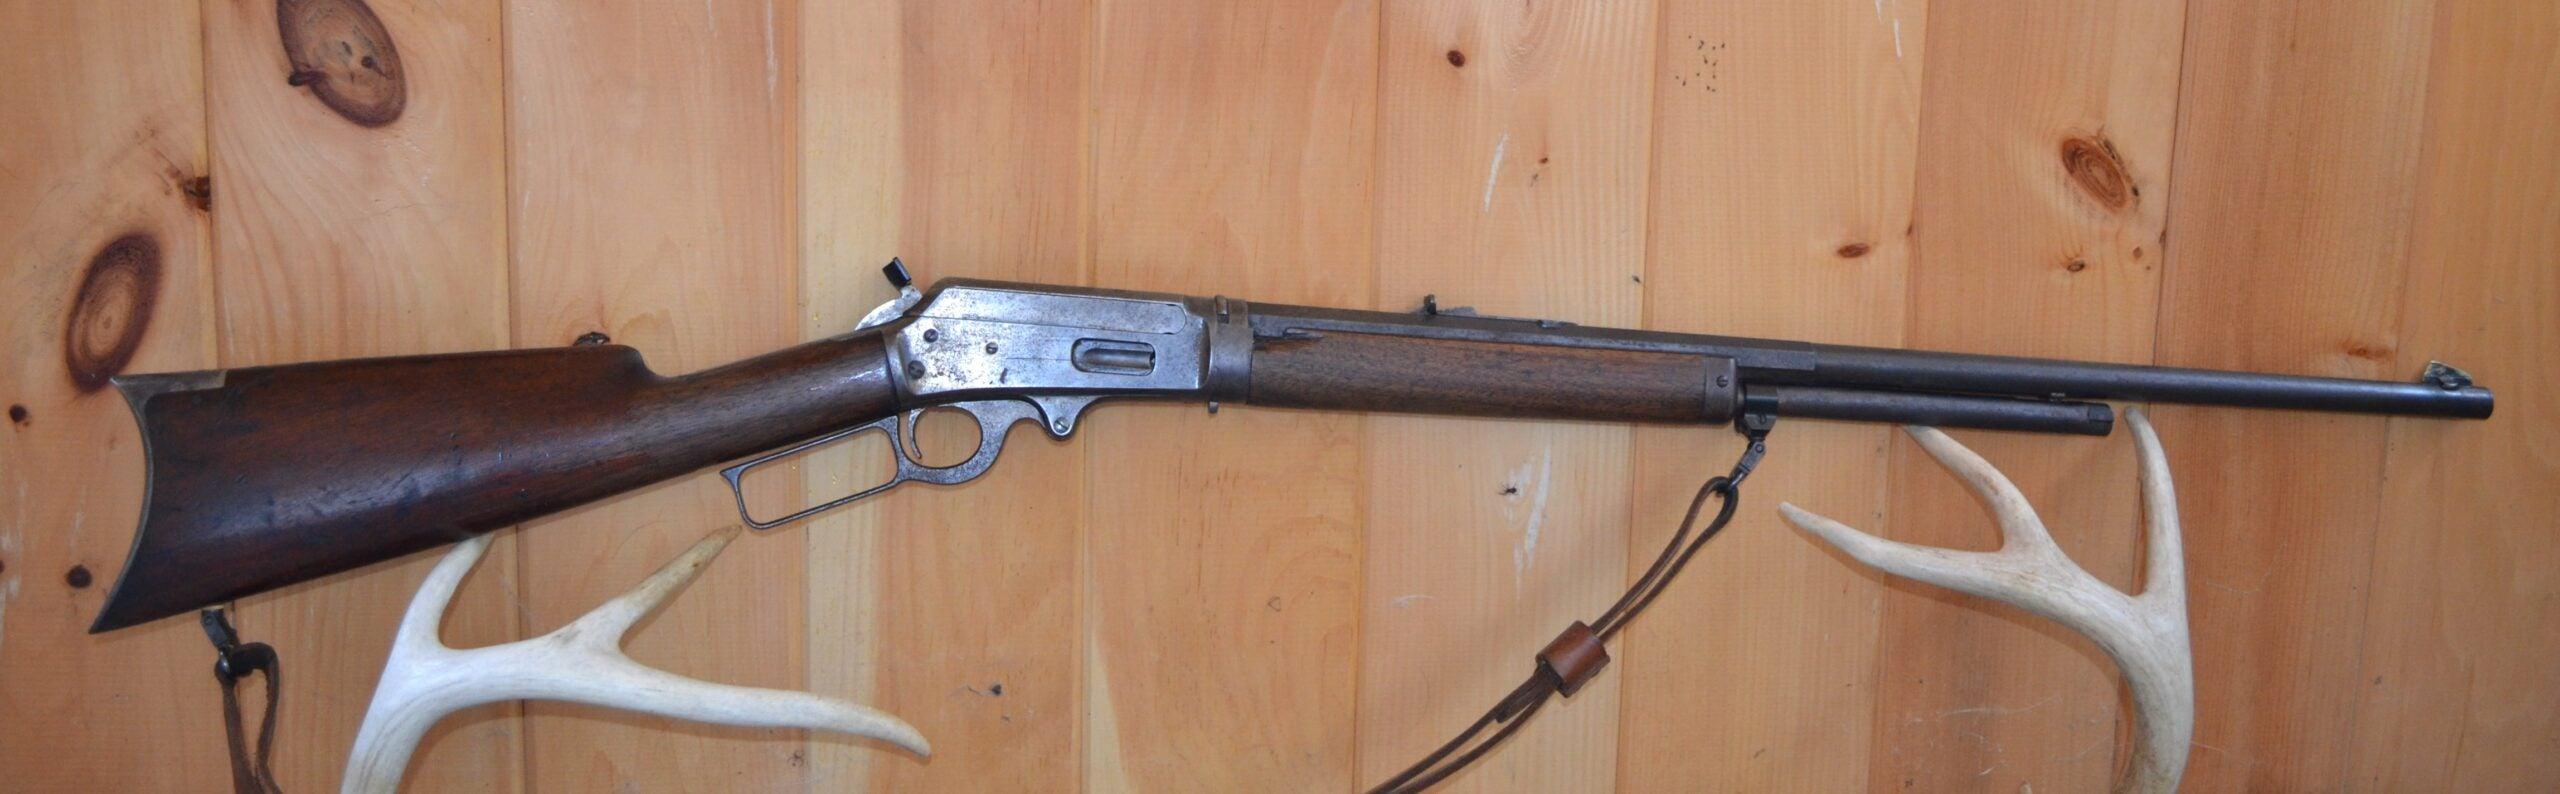 My Favorite Gun: Marlin 1893